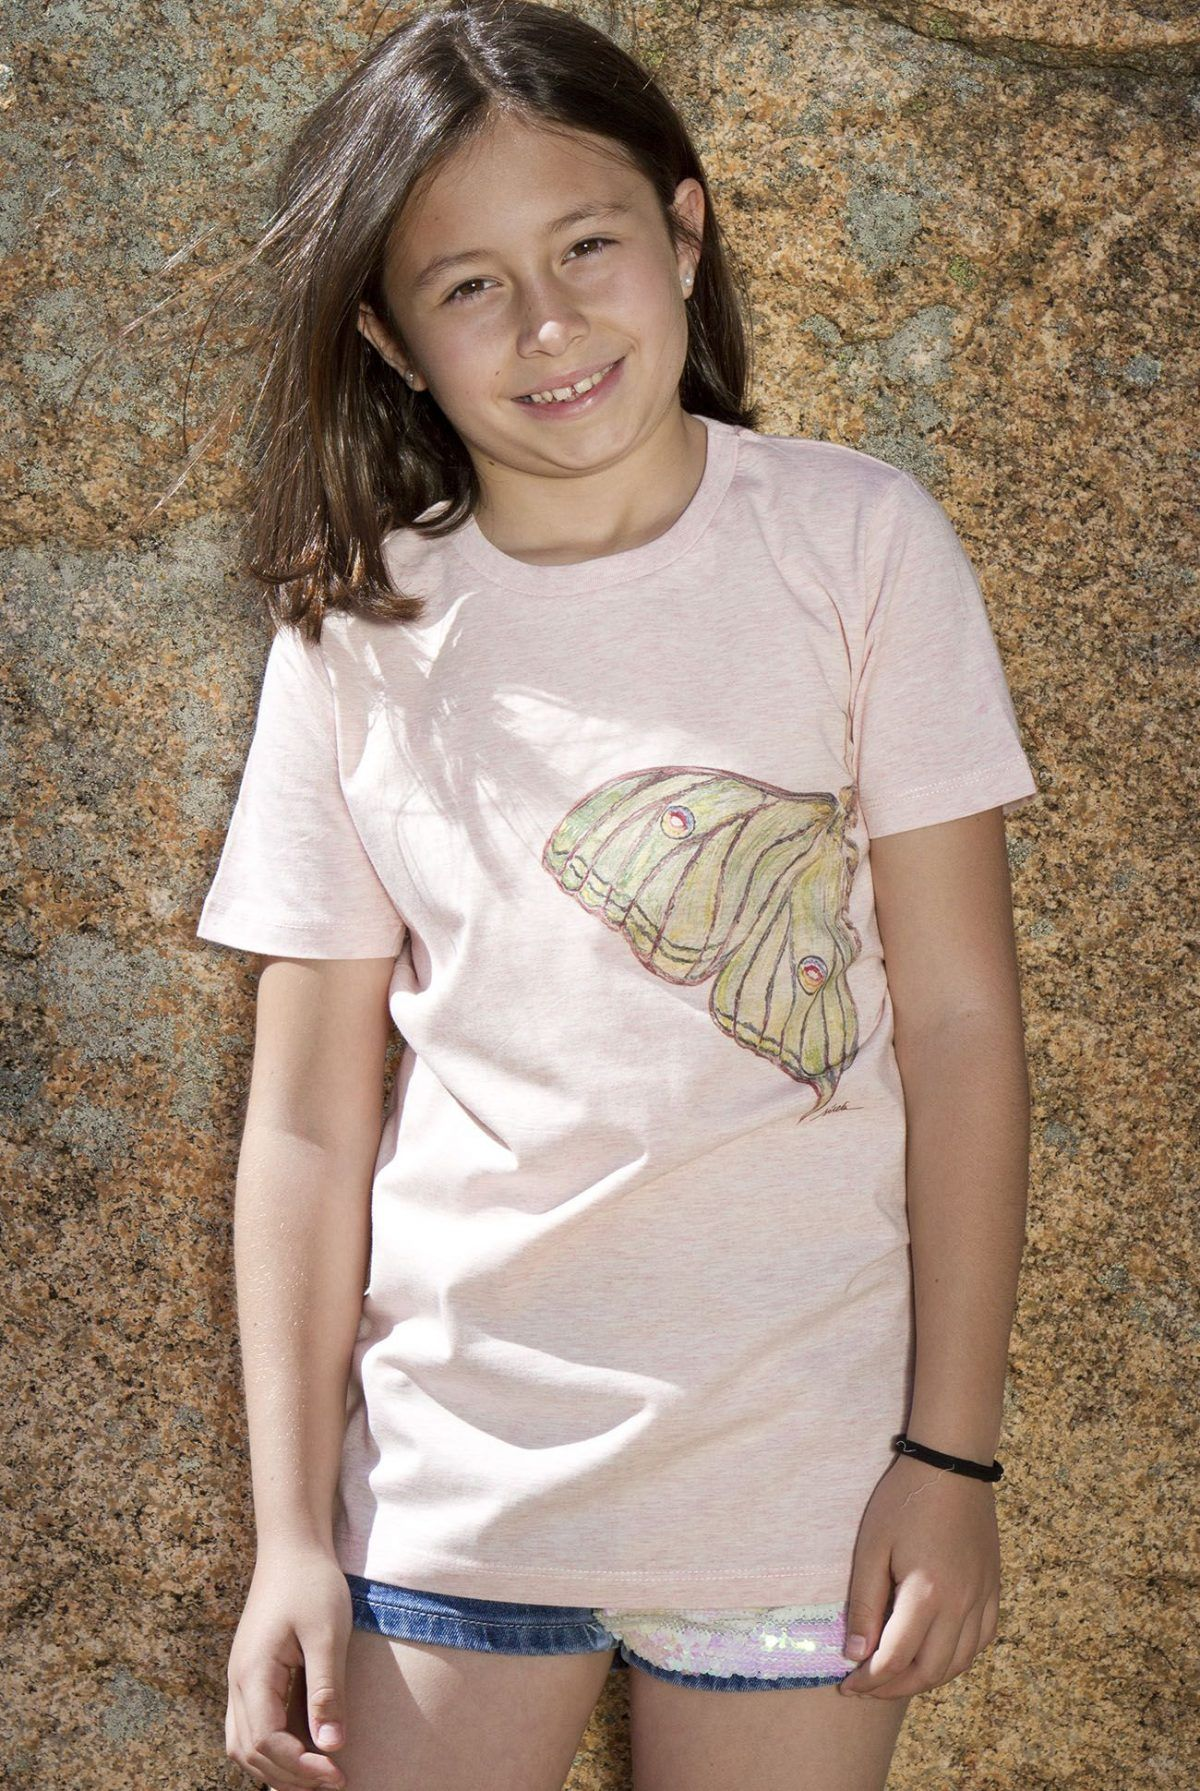 camiseta mariposa graellsia isabellae-algodon organico-sirem wild-moda infantil